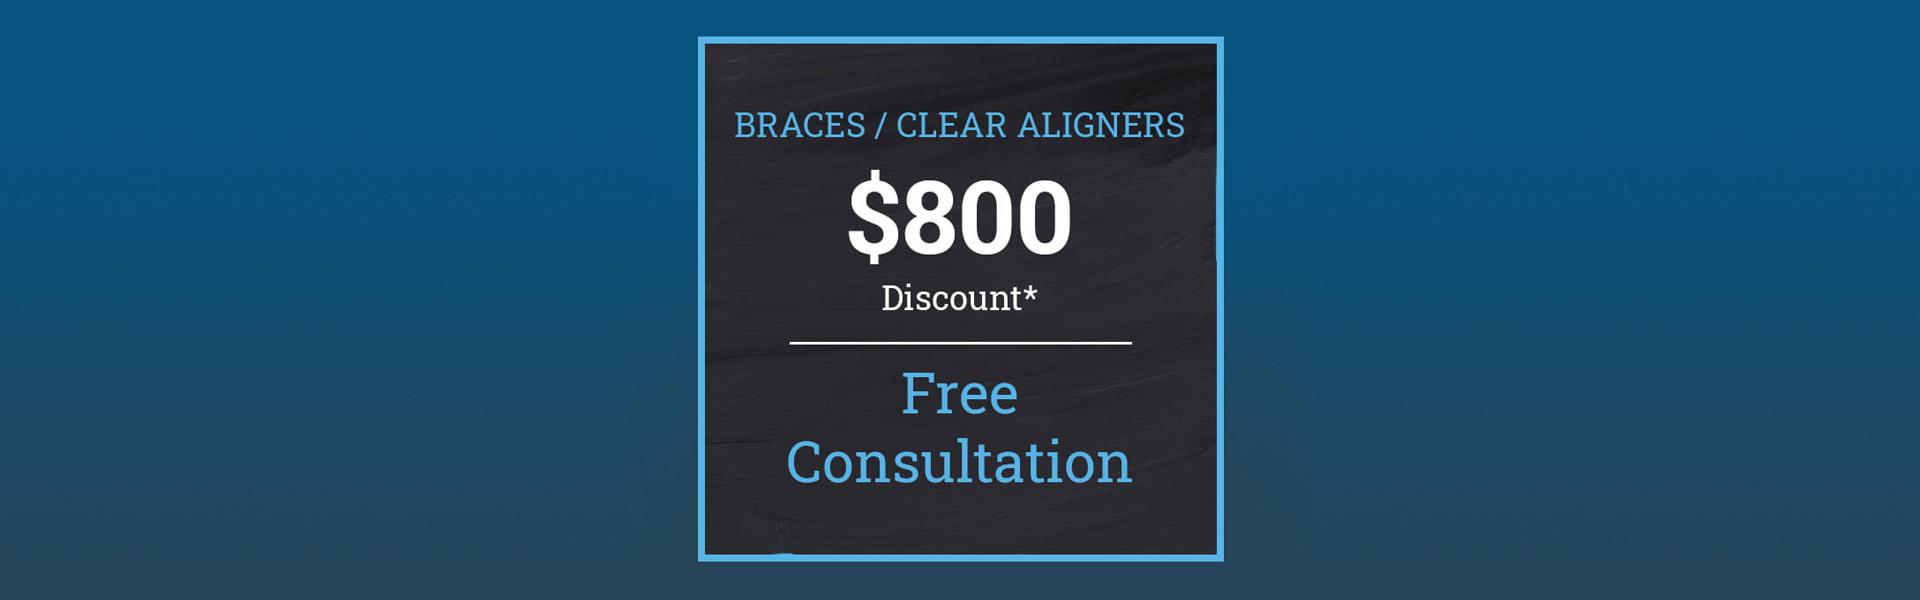 Free-Consultation-baner